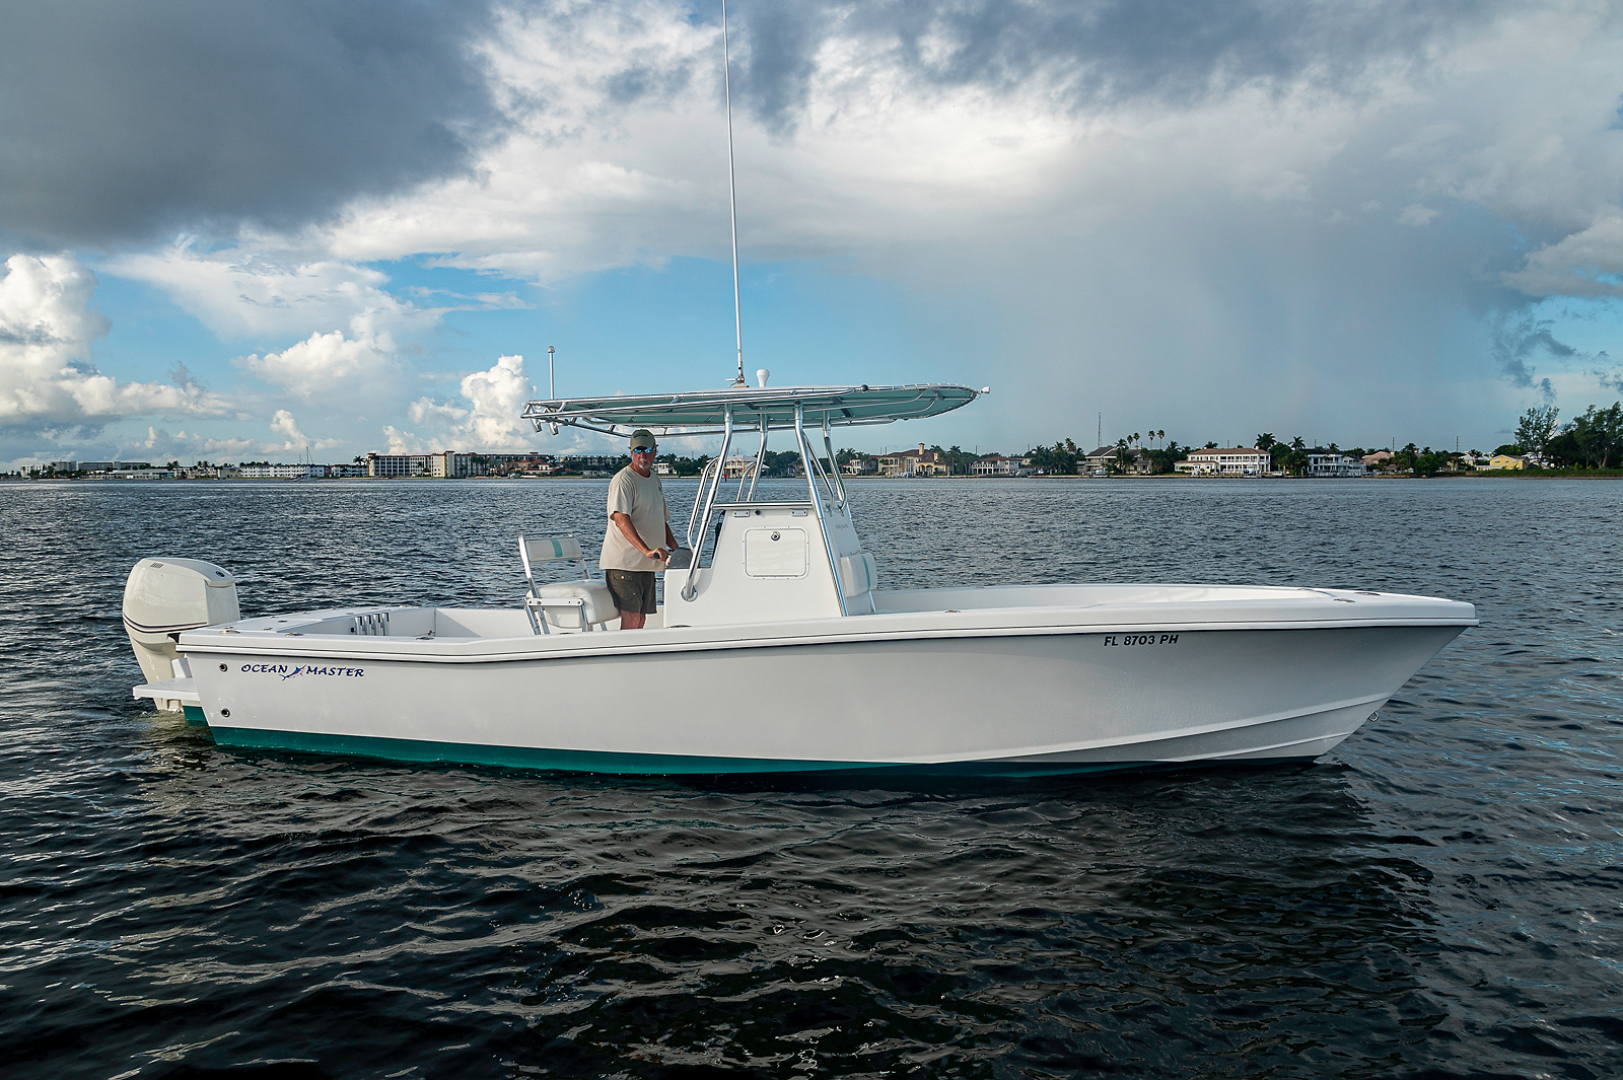 Ocean Master 2013-27 Ocean Master Palm Beach-Florida-United States-27 Ocean Master-1501373 | Thumbnail